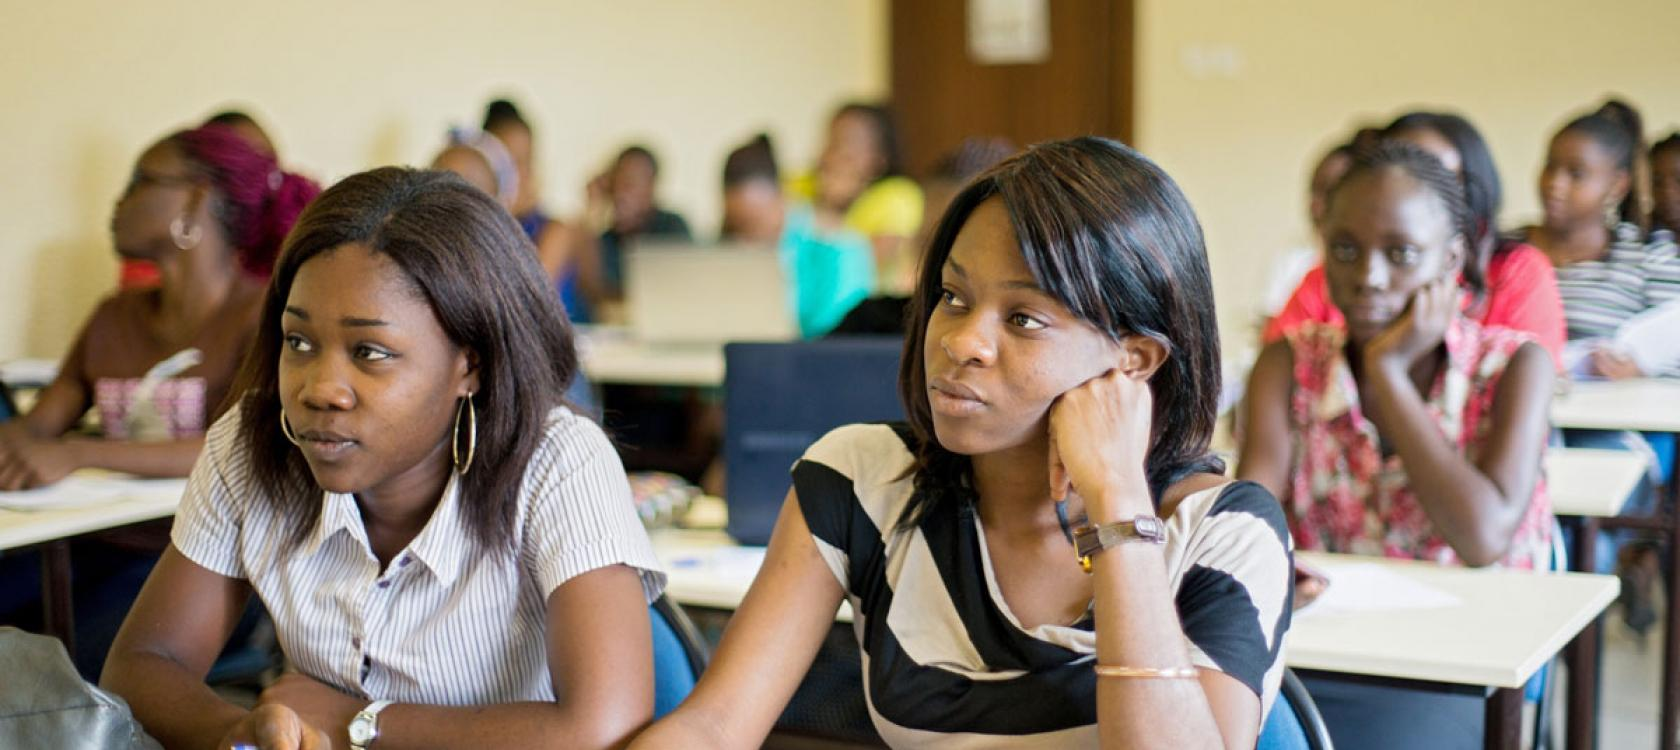 Étudiantes, Kinshasa, RDC,éducation